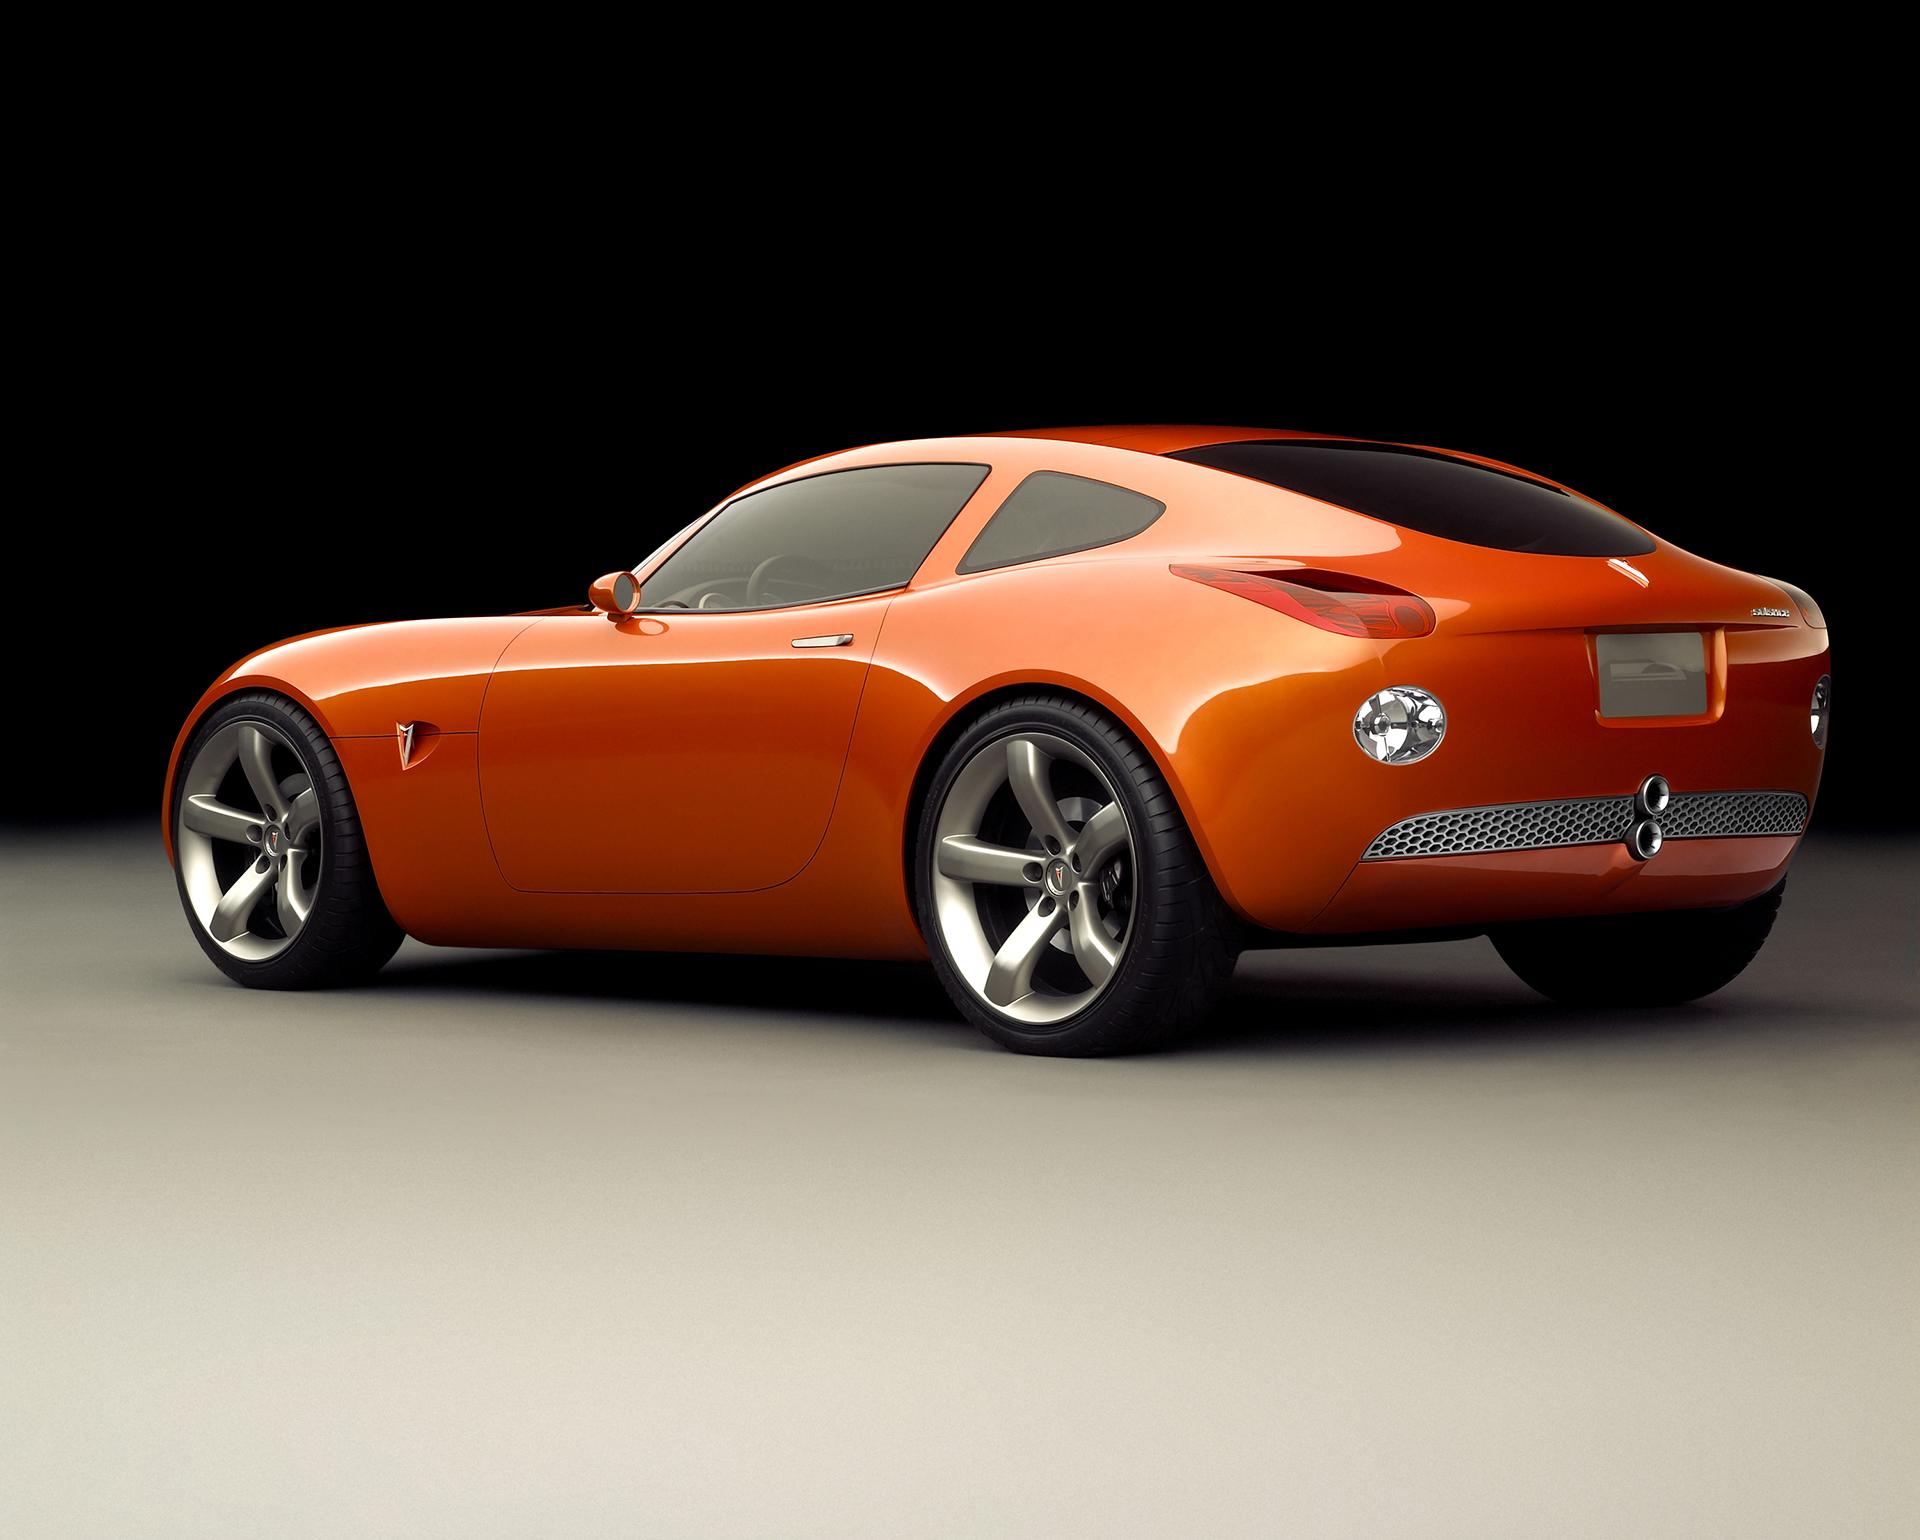 2002 pontiac solstice coupe concept rear three-quarter